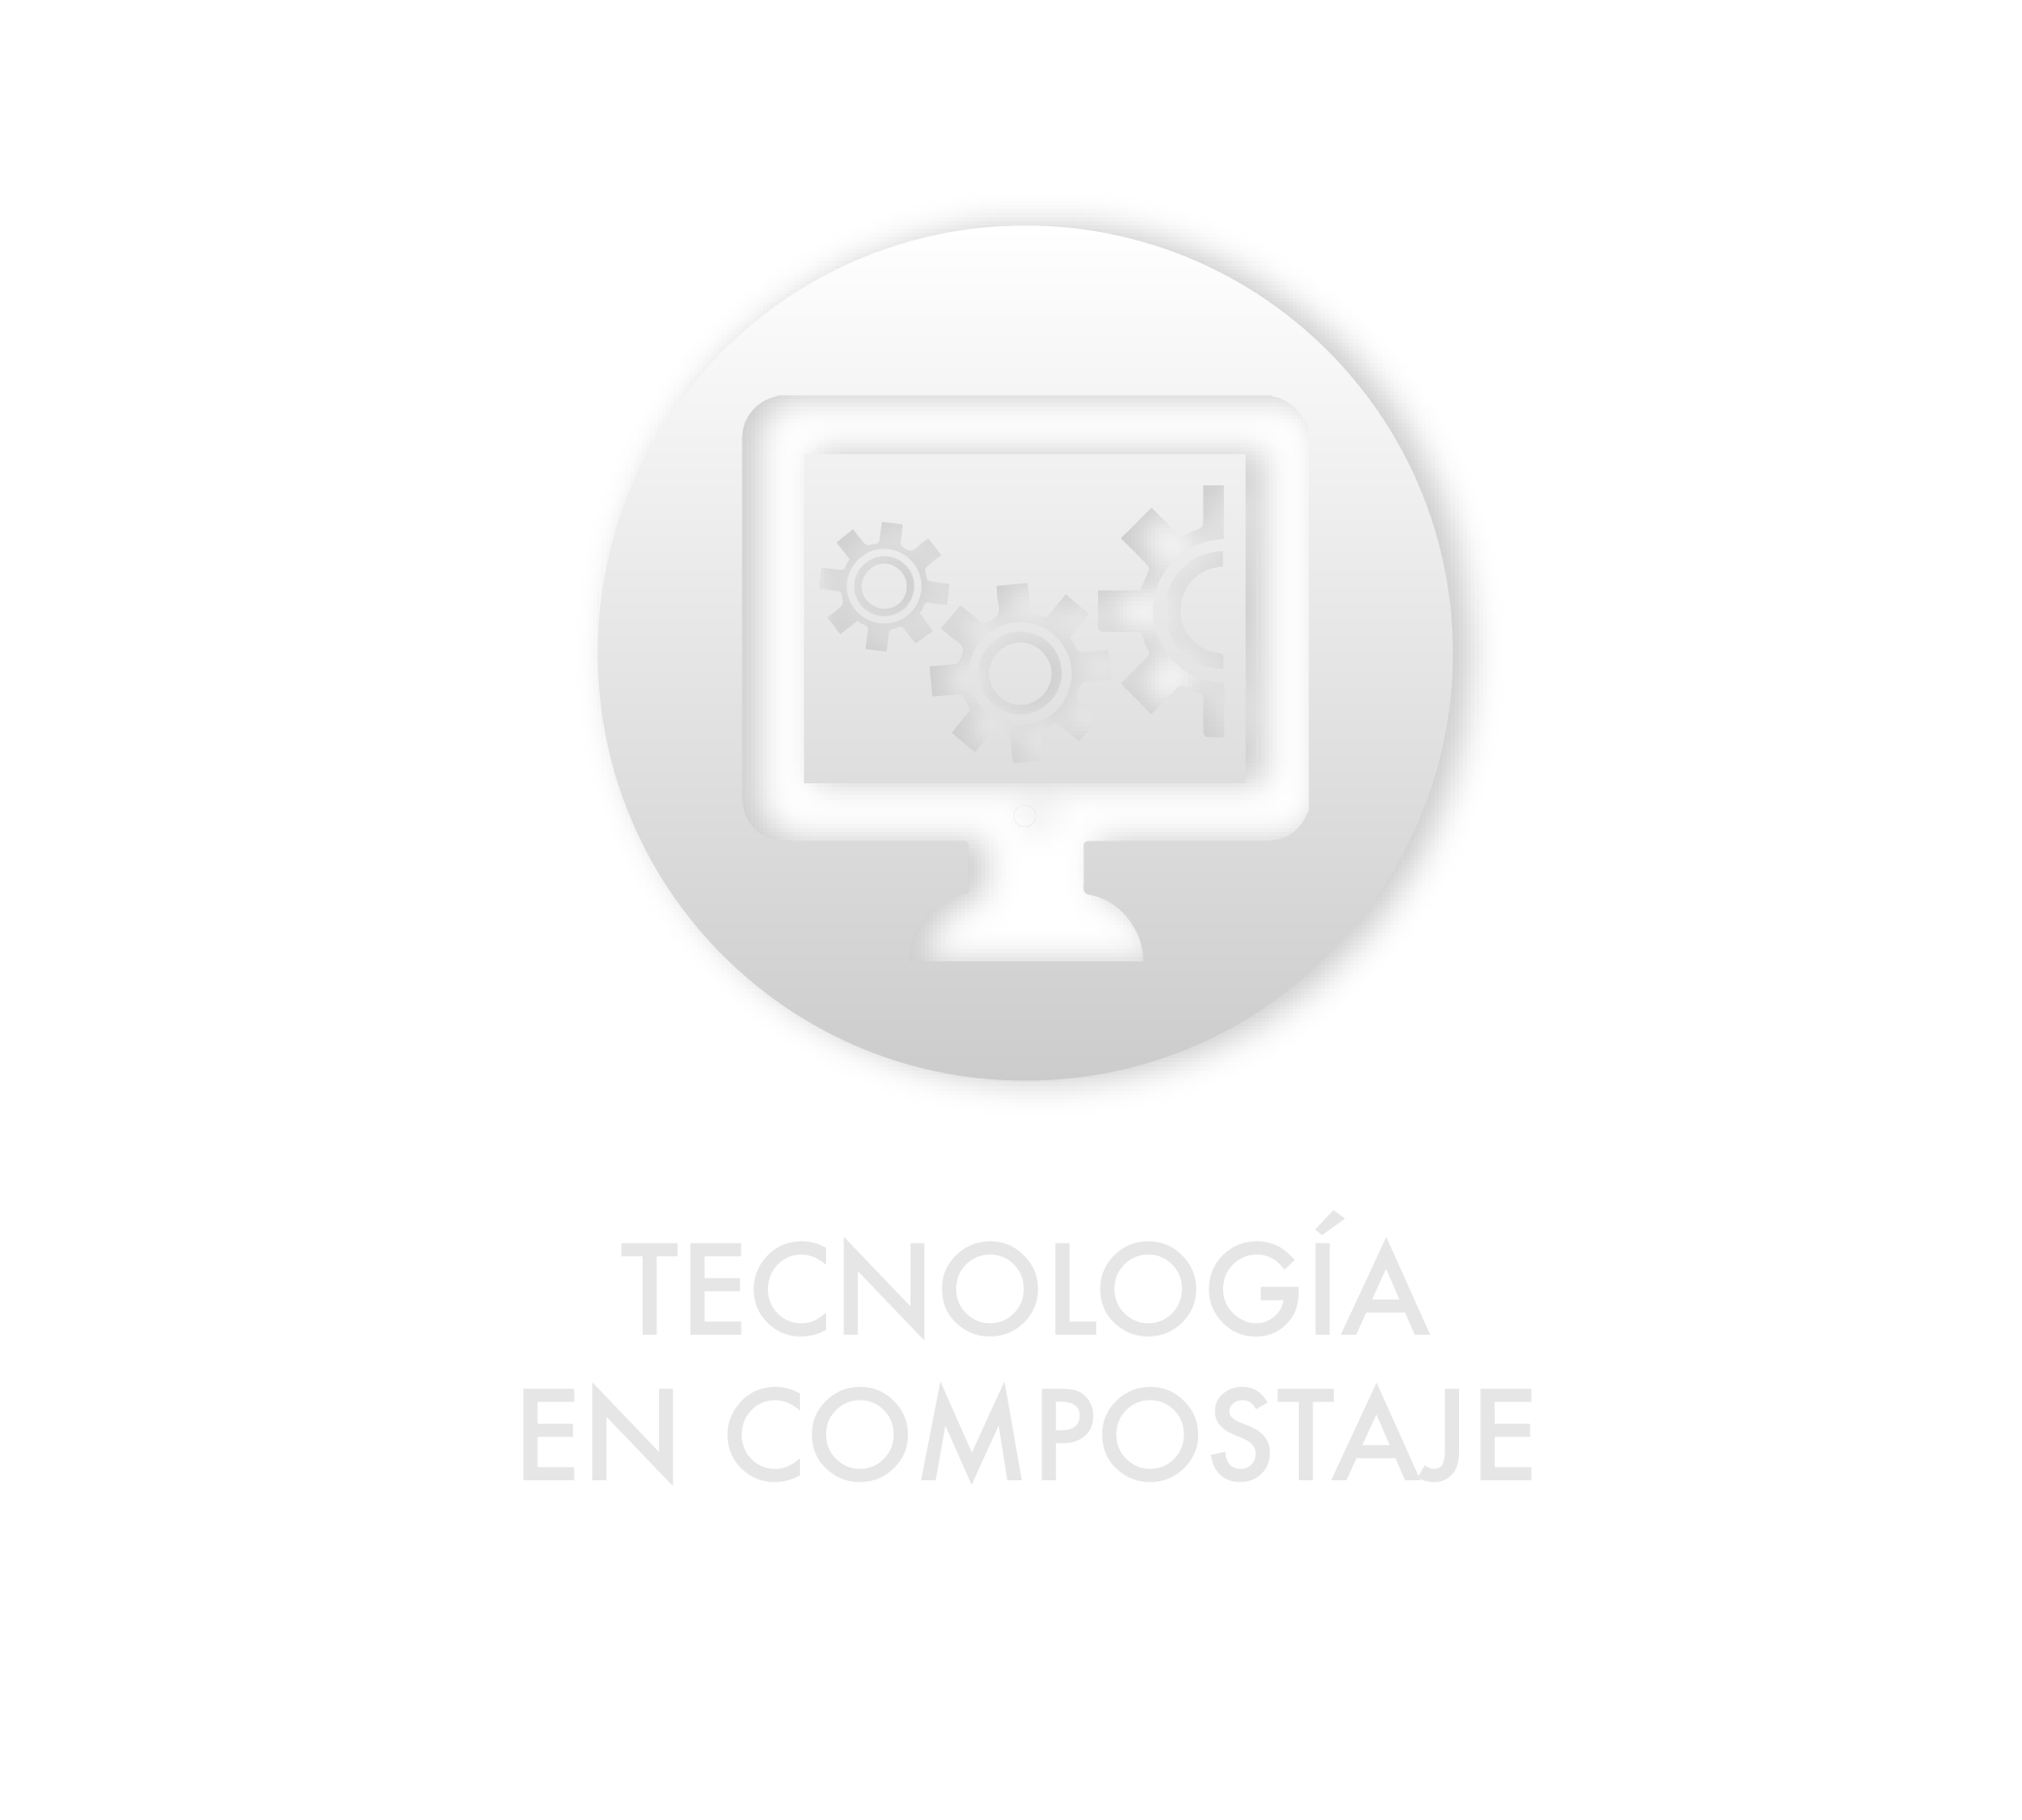 tecnologia y compostaje_v1-01